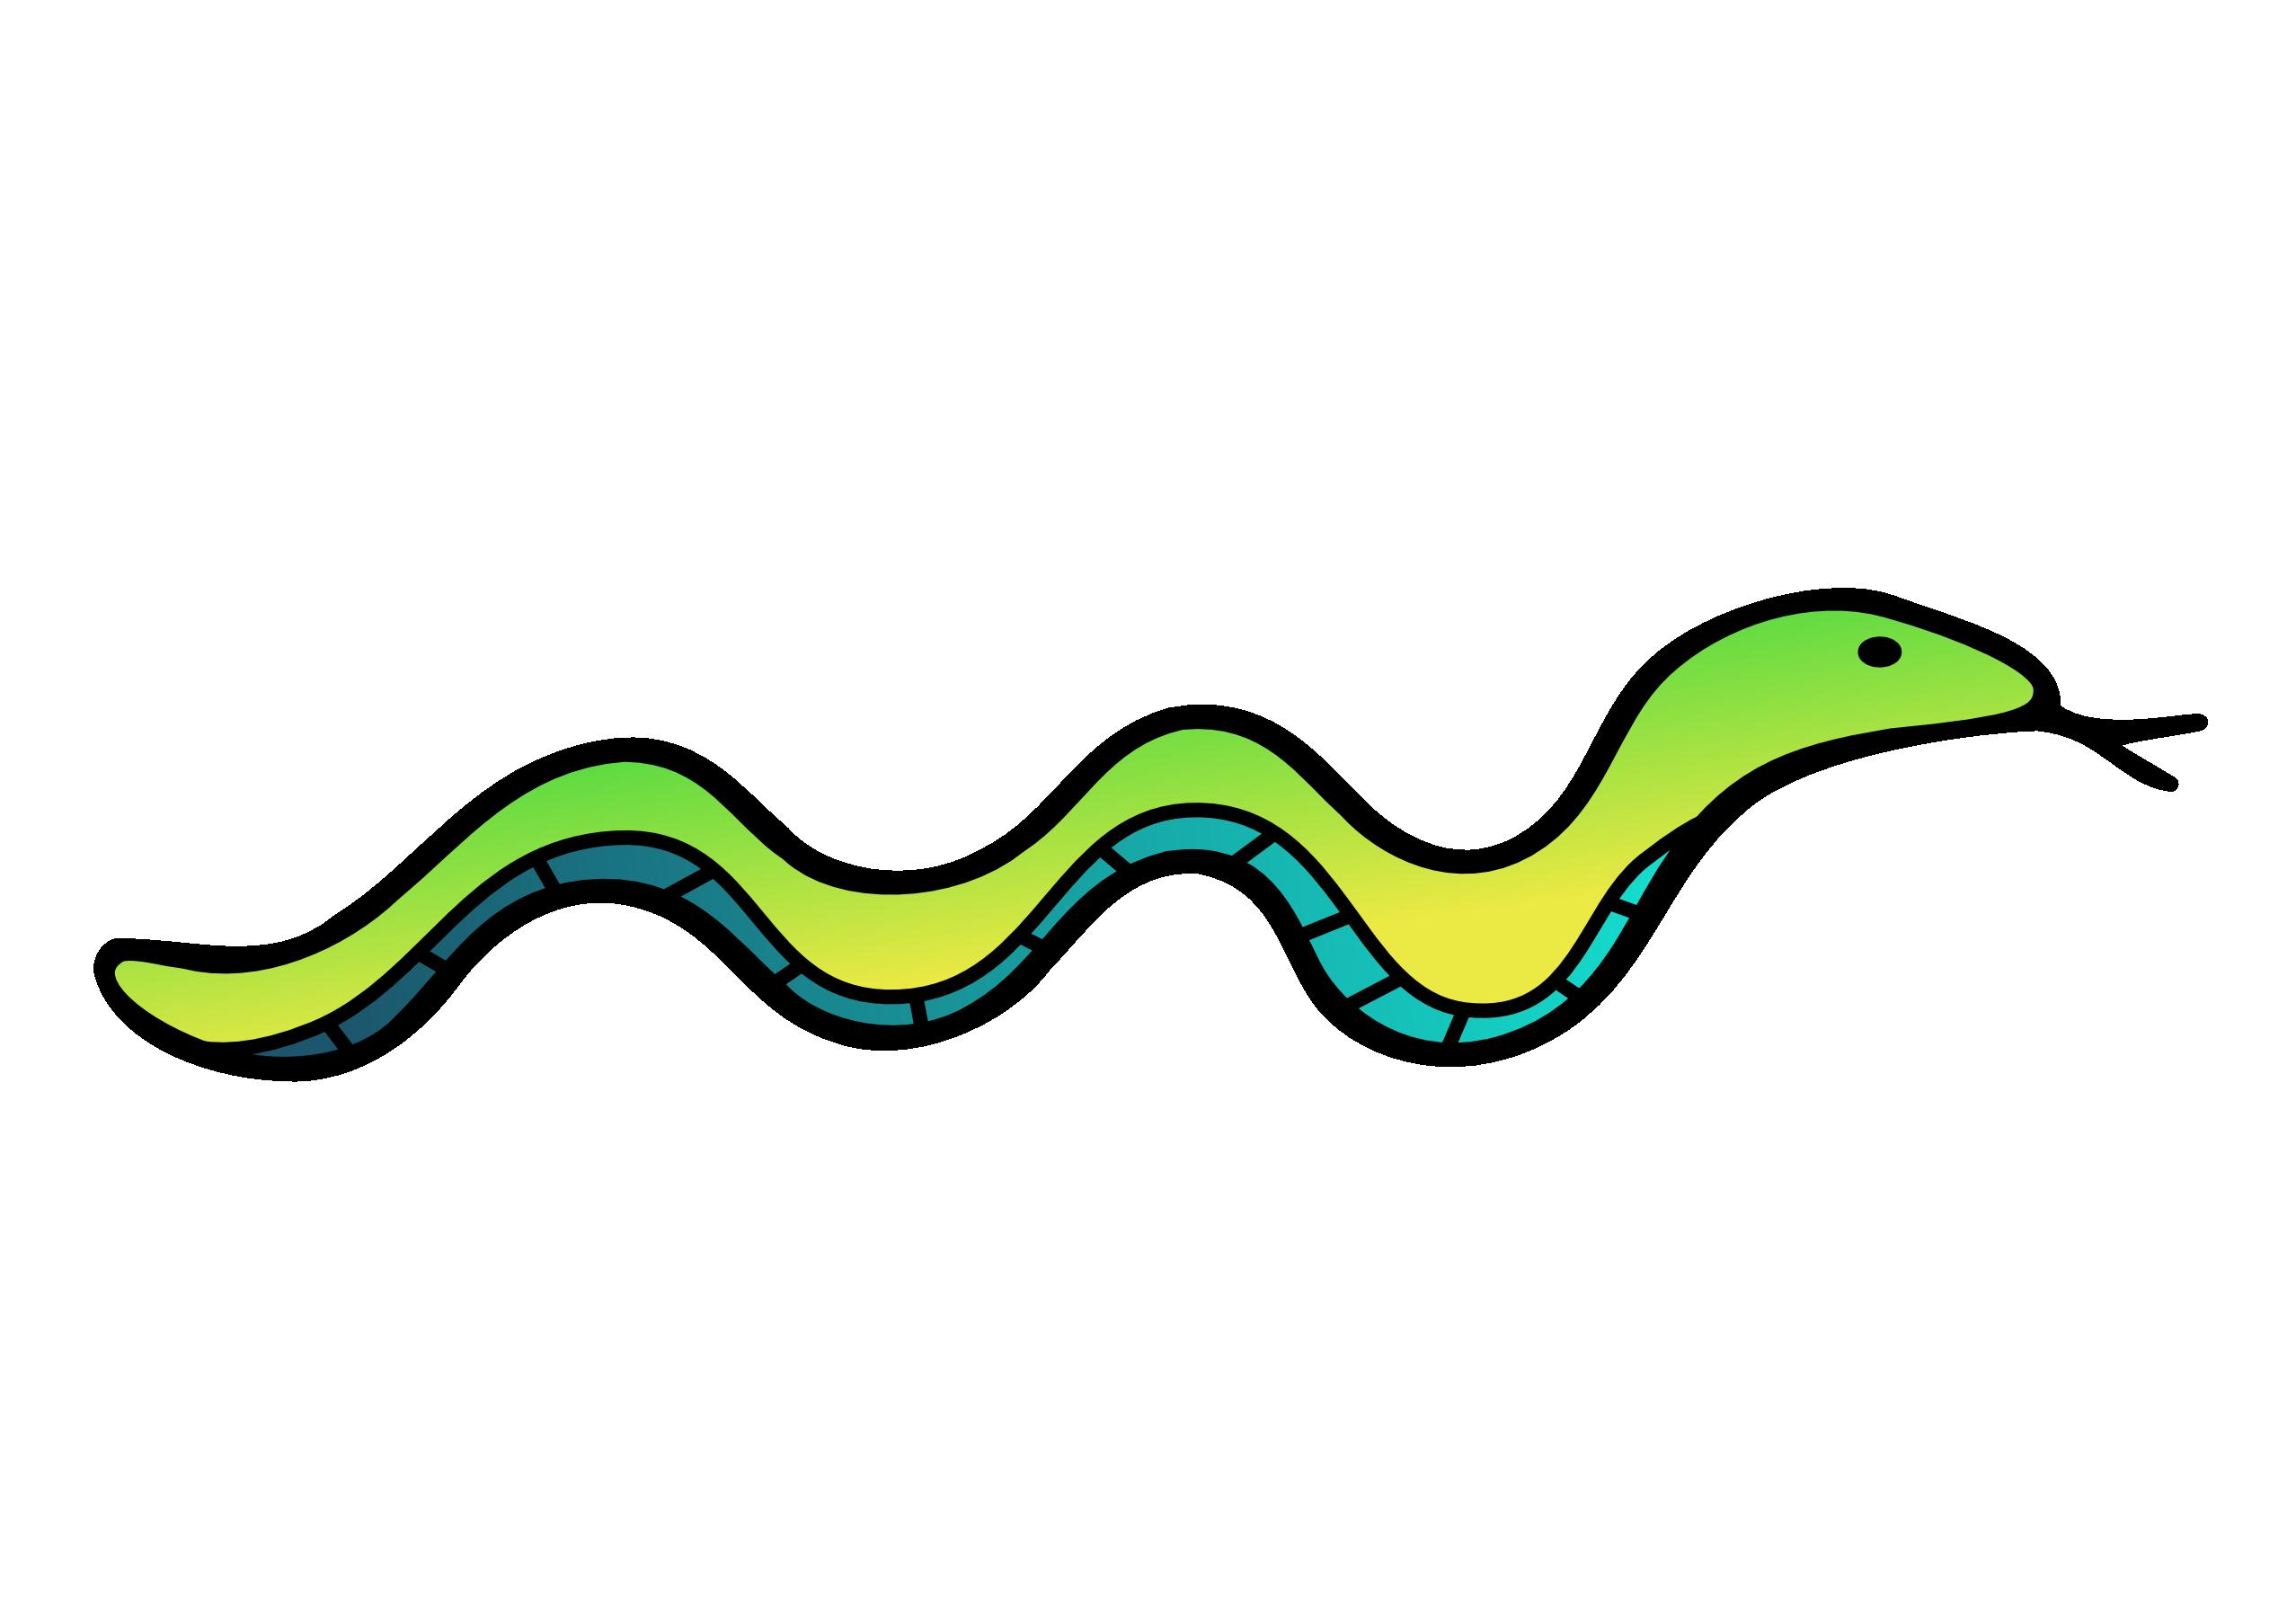 Snake Clip Art - ClipArt Best